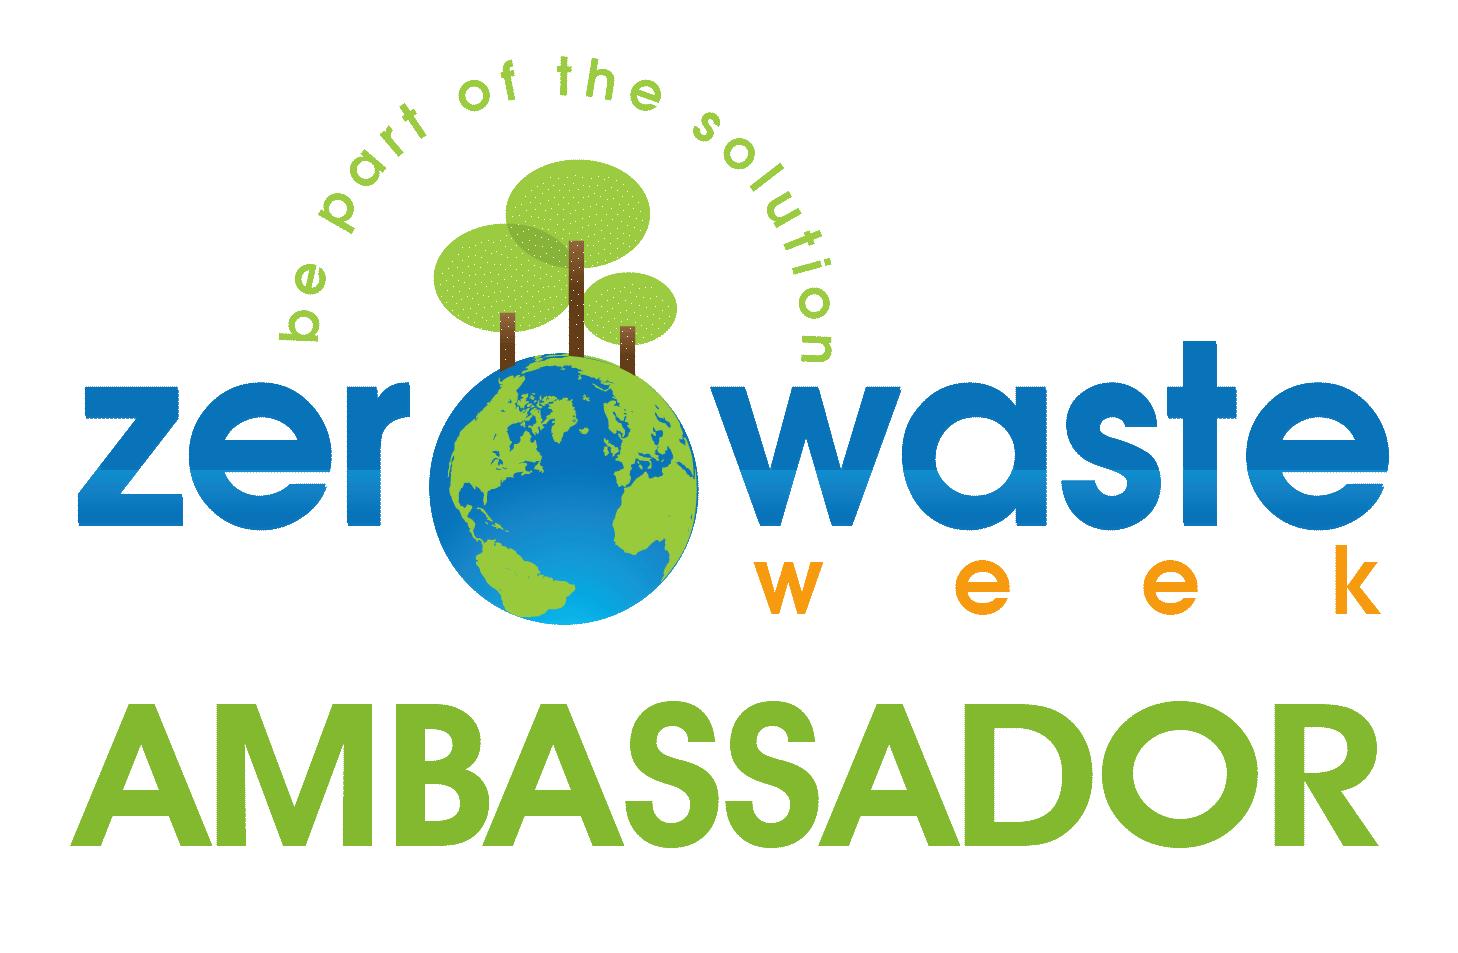 ambassador-tree-trans